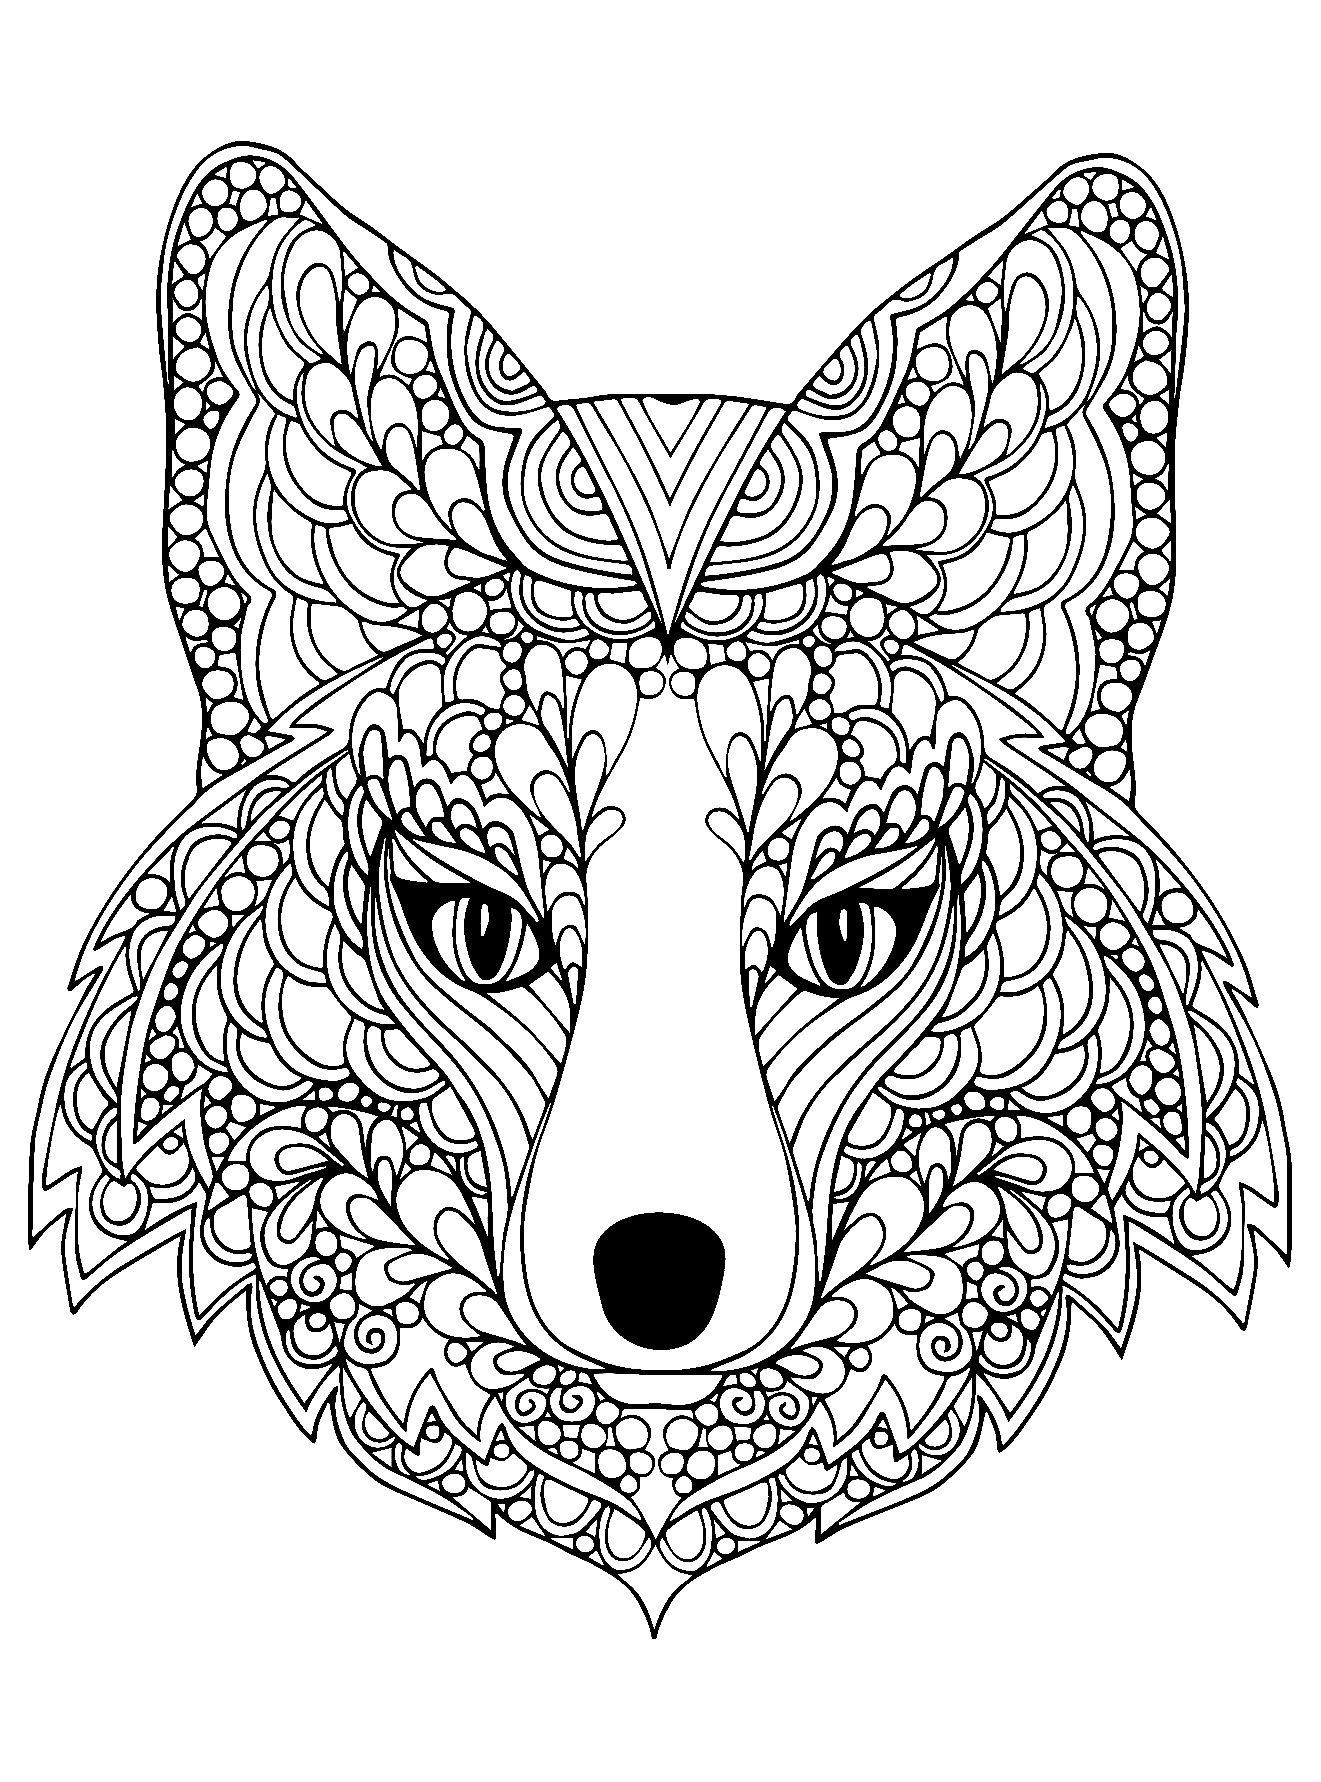 Animals | Coloriage Mandala Animaux, Coloriage Mandala dedans Coloriage De Mandala Difficile A Imprimer